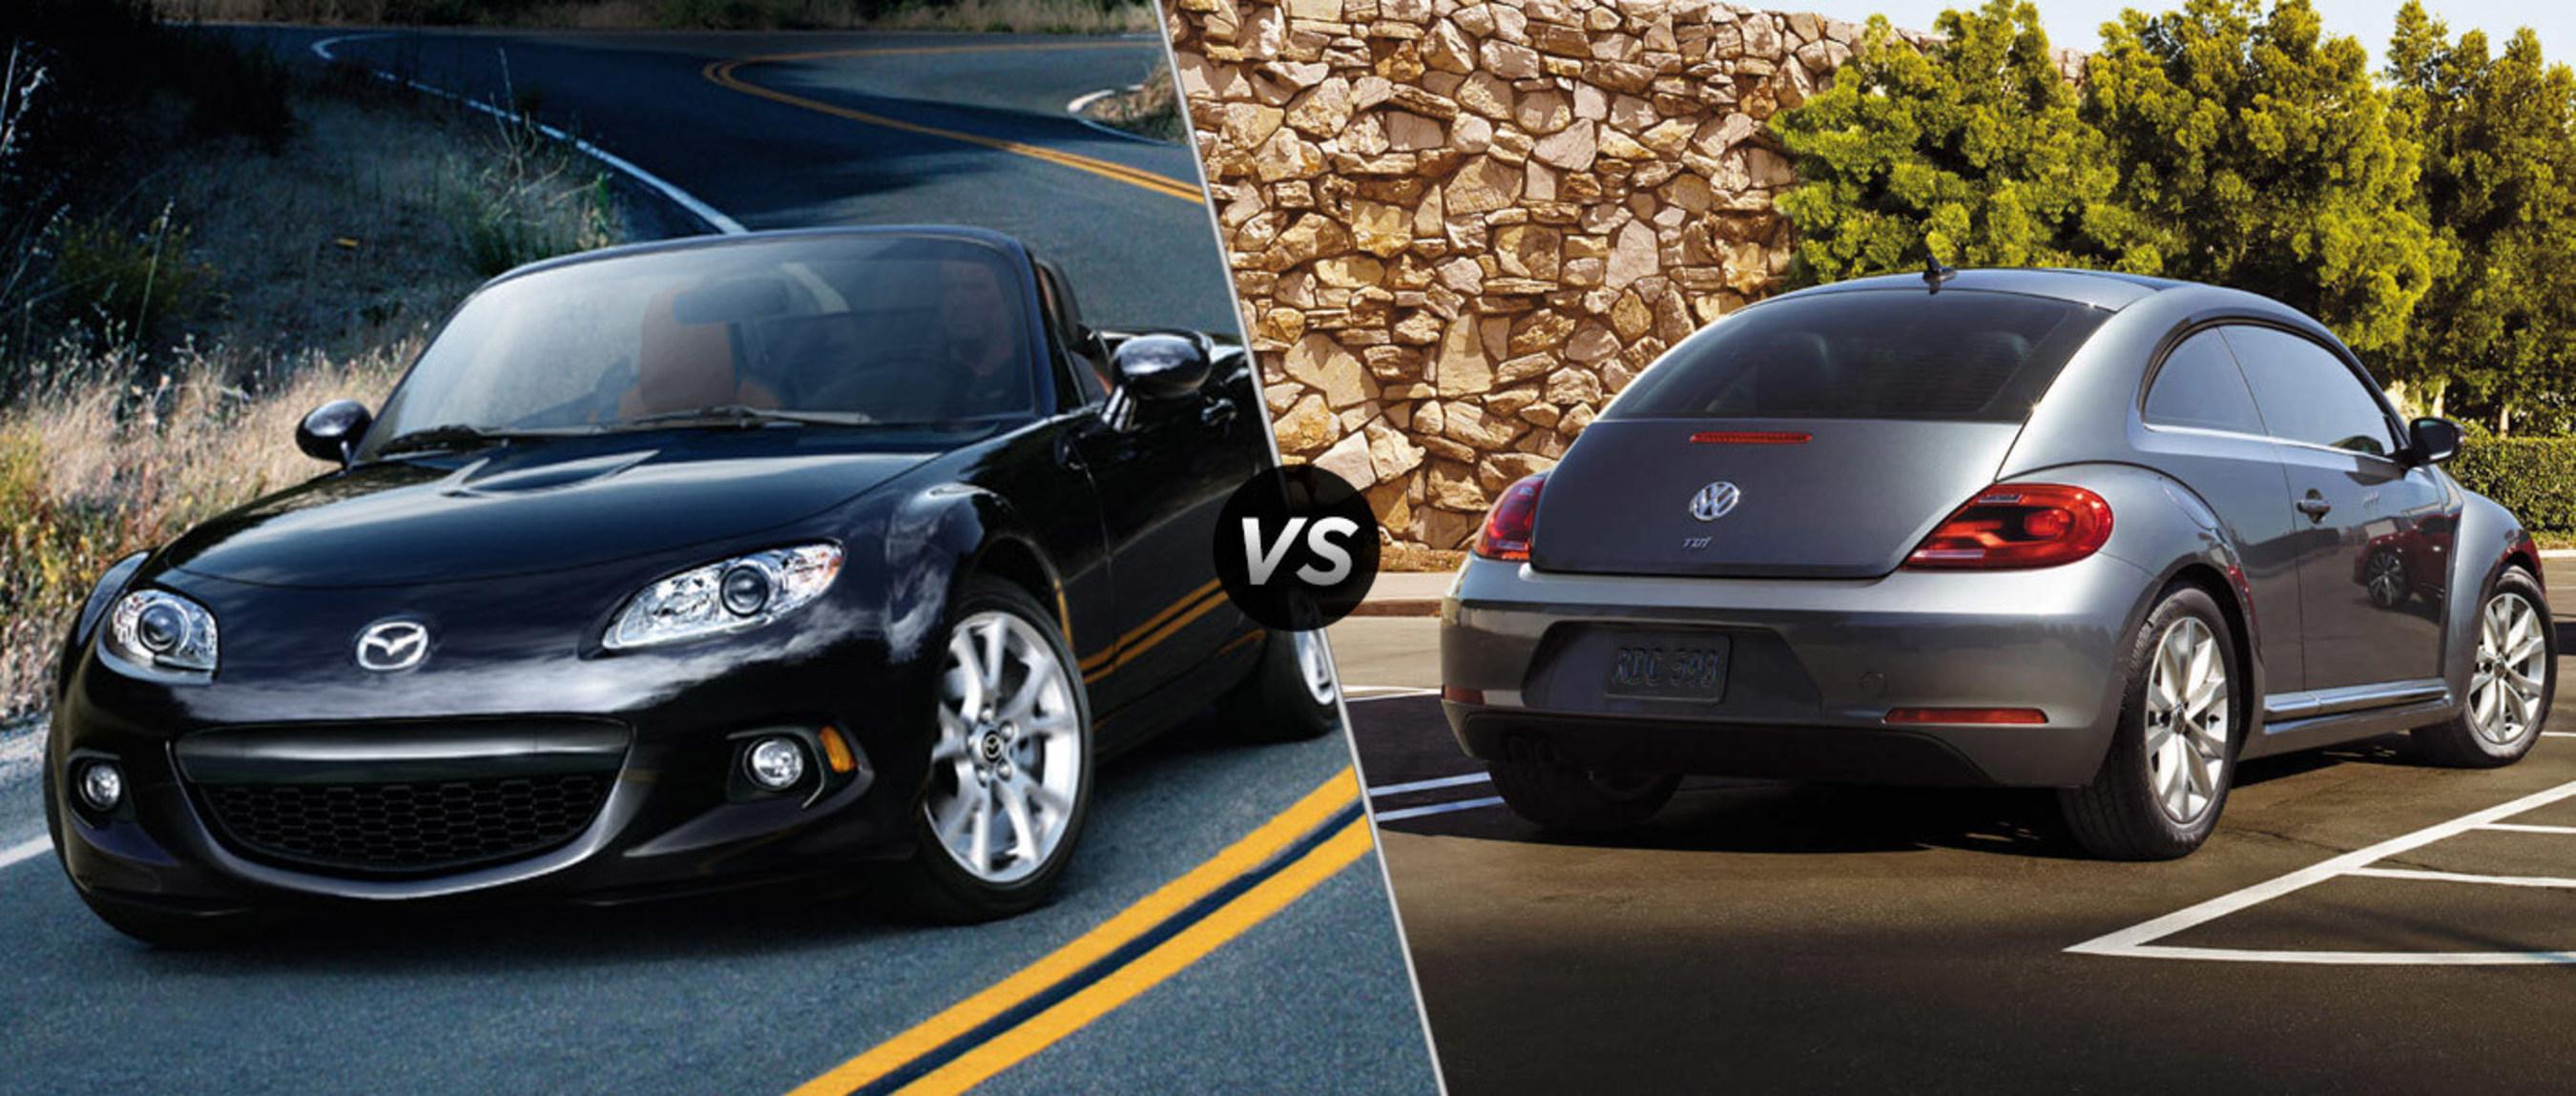 Dealership comparison finds 2015 Mazda Miata outshines 2015 Volkswagen Beetle